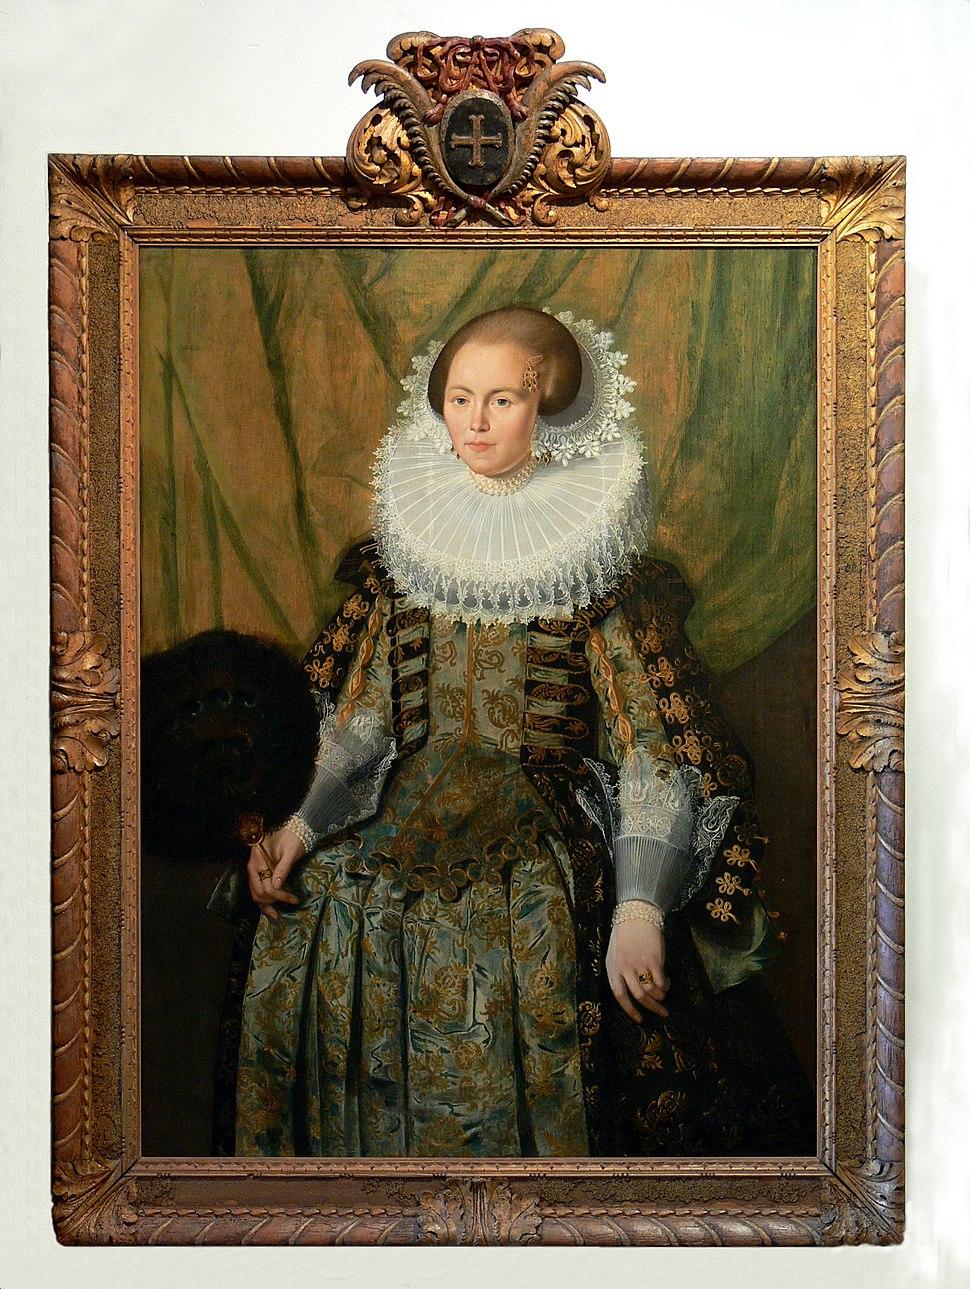 WLANL - M.arjon - Portret Eva Ment